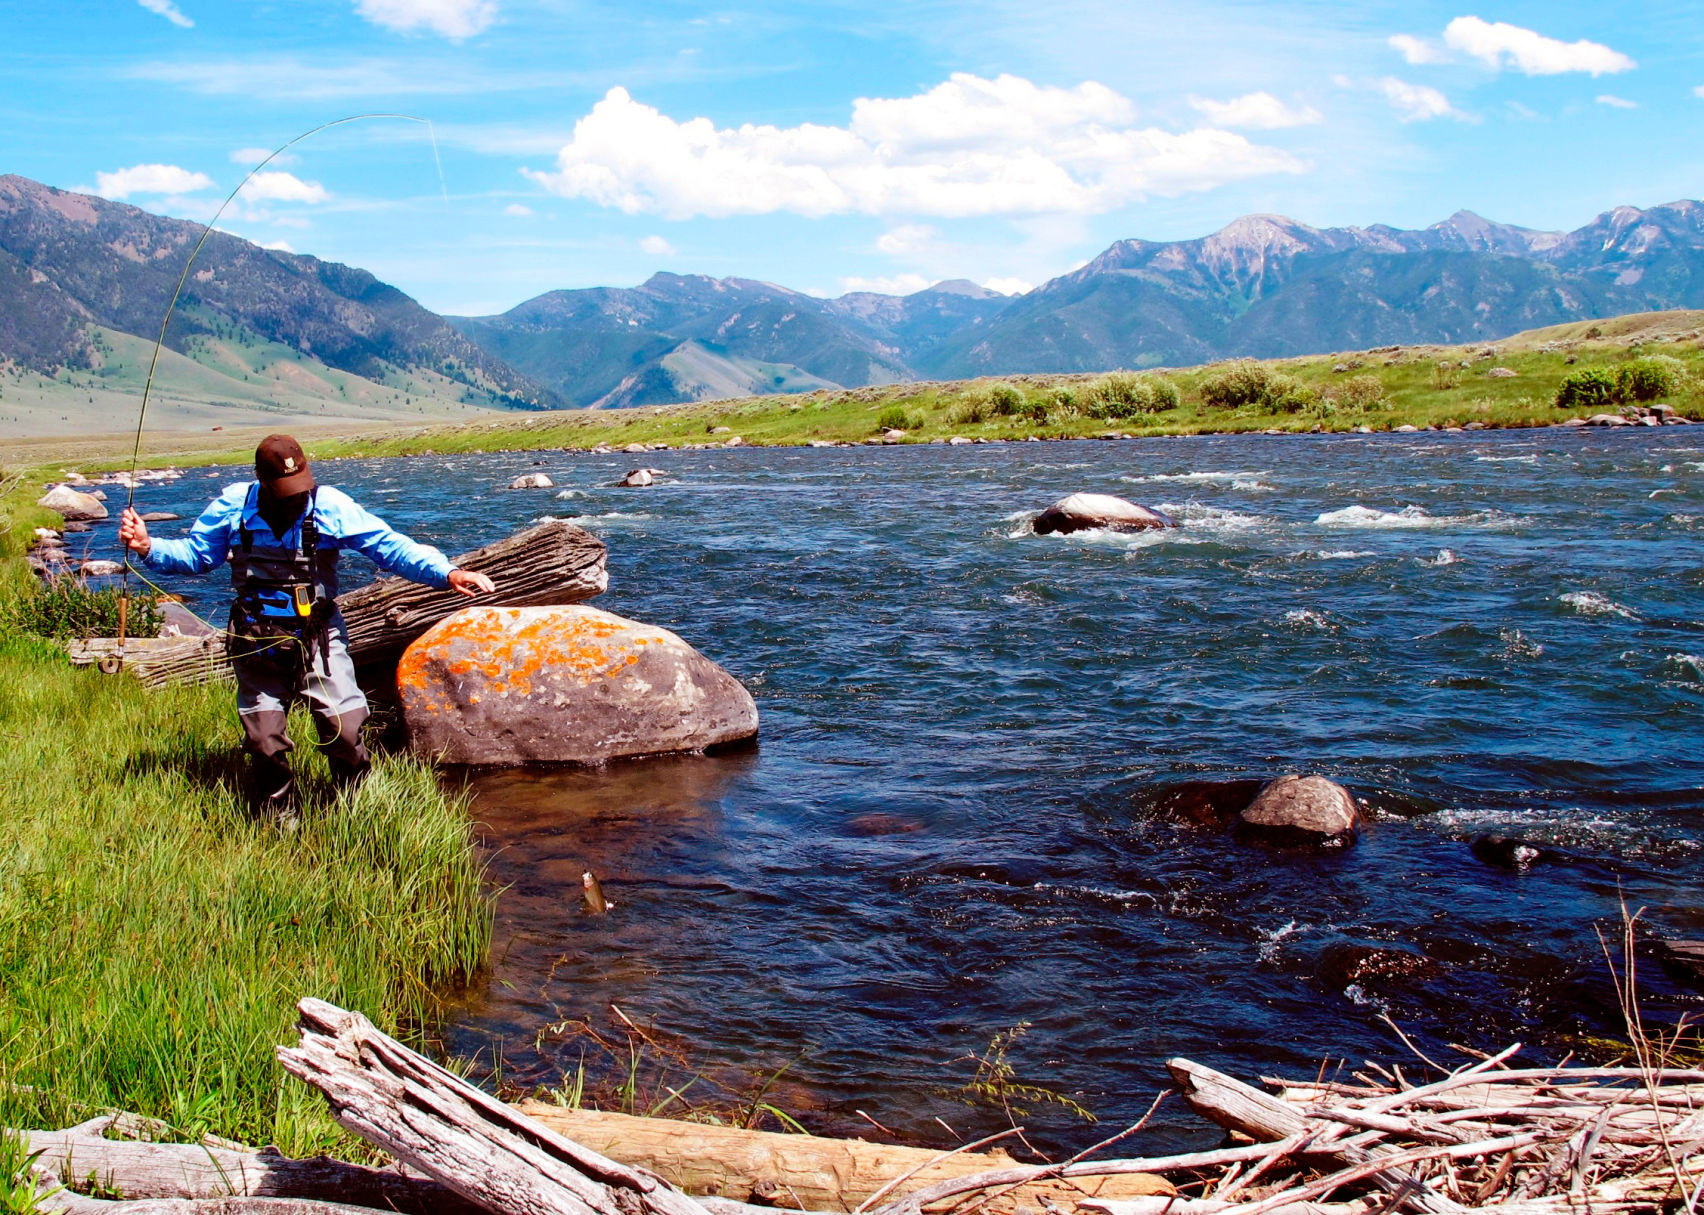 fwp releases report on madison river fishing pressure environment rh bozemandailychronicle com